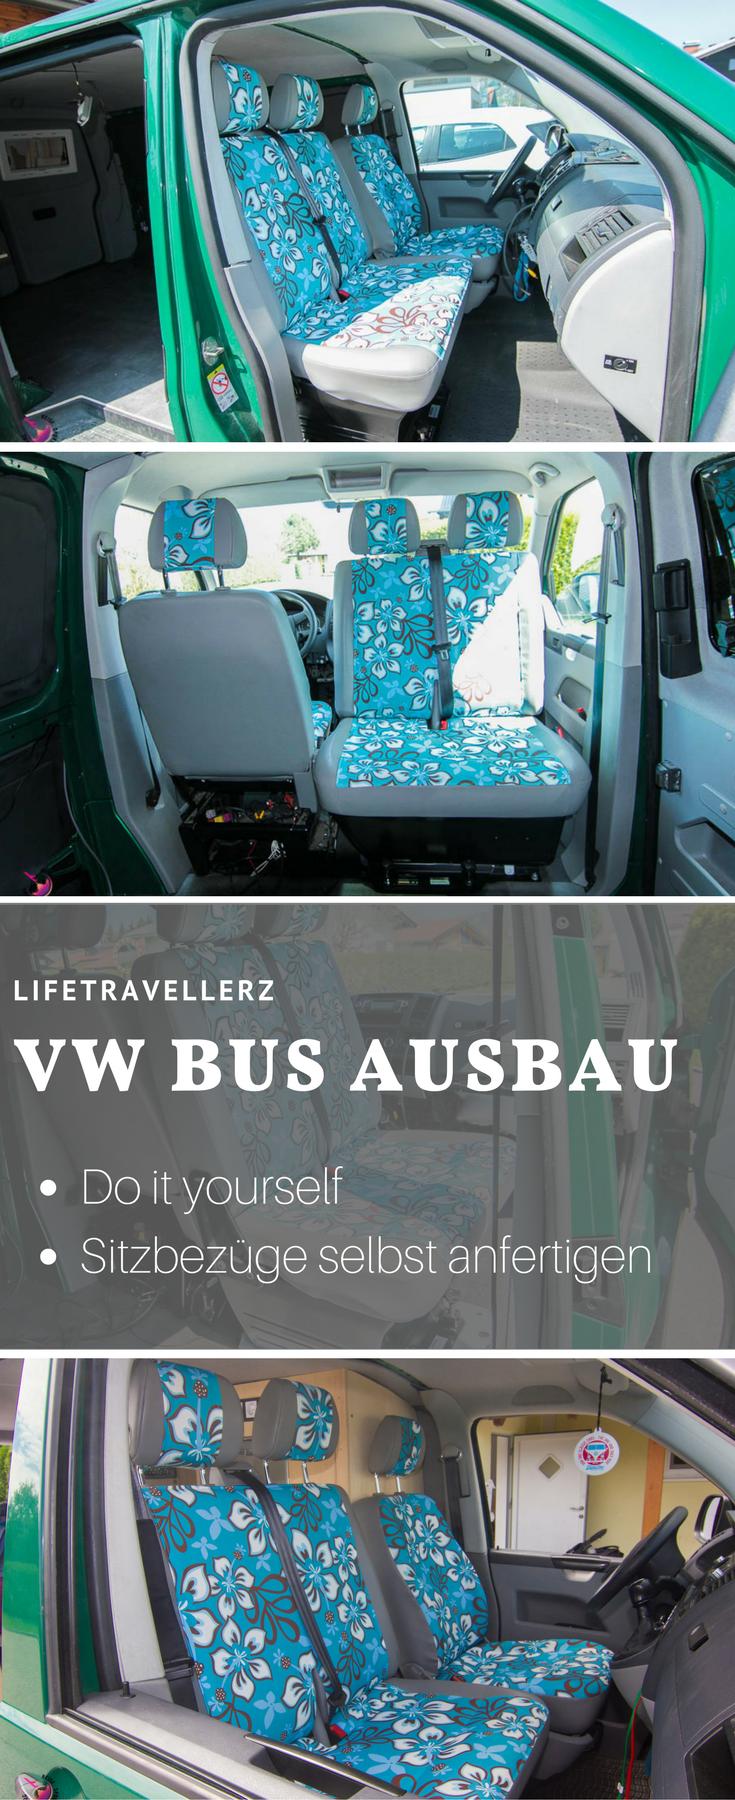 vw t5 ausbau teil 8 autositze im vw bus neu beziehen. Black Bedroom Furniture Sets. Home Design Ideas